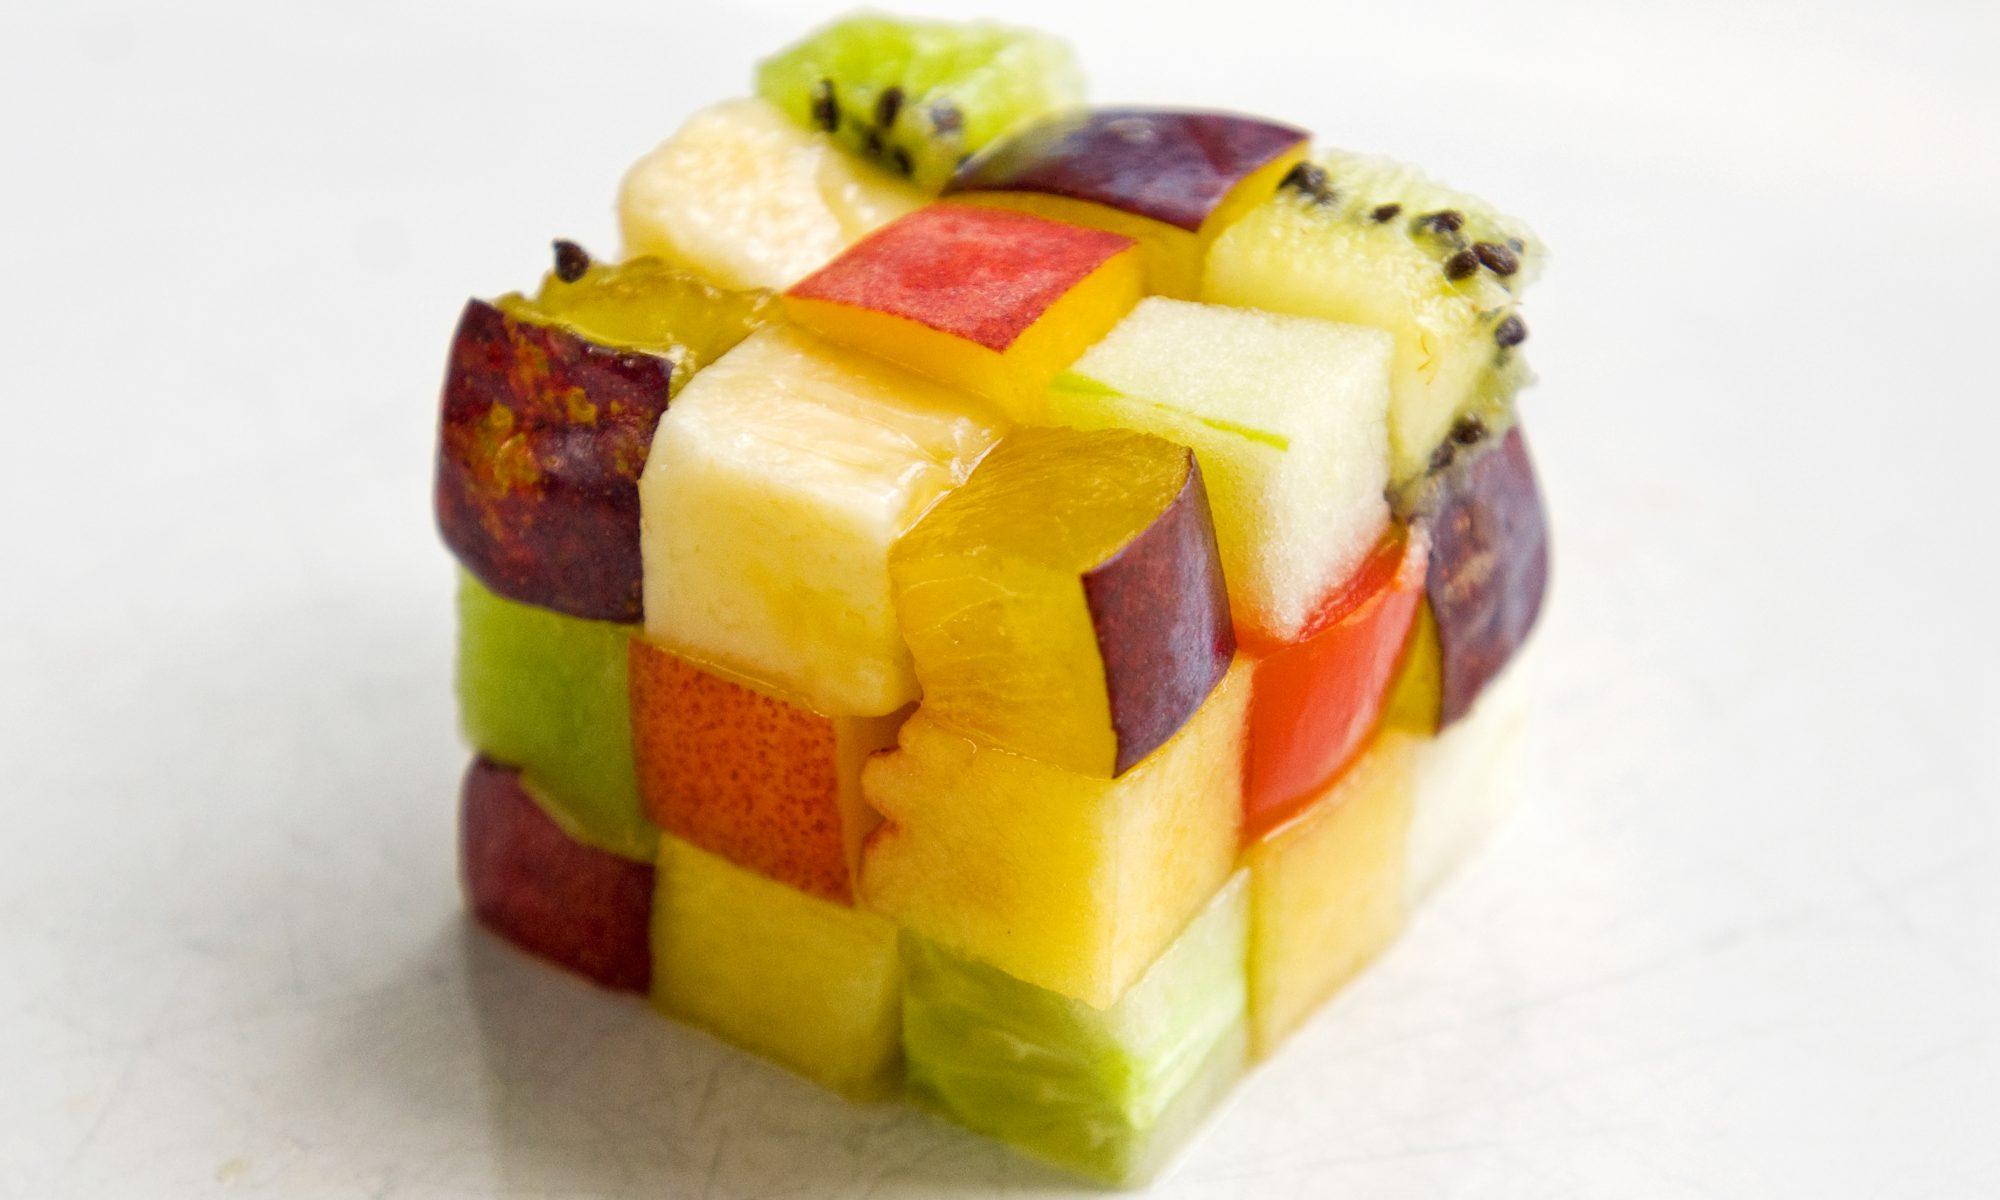 EC: Should You Buy Fruit Pre-Cut or Whole?